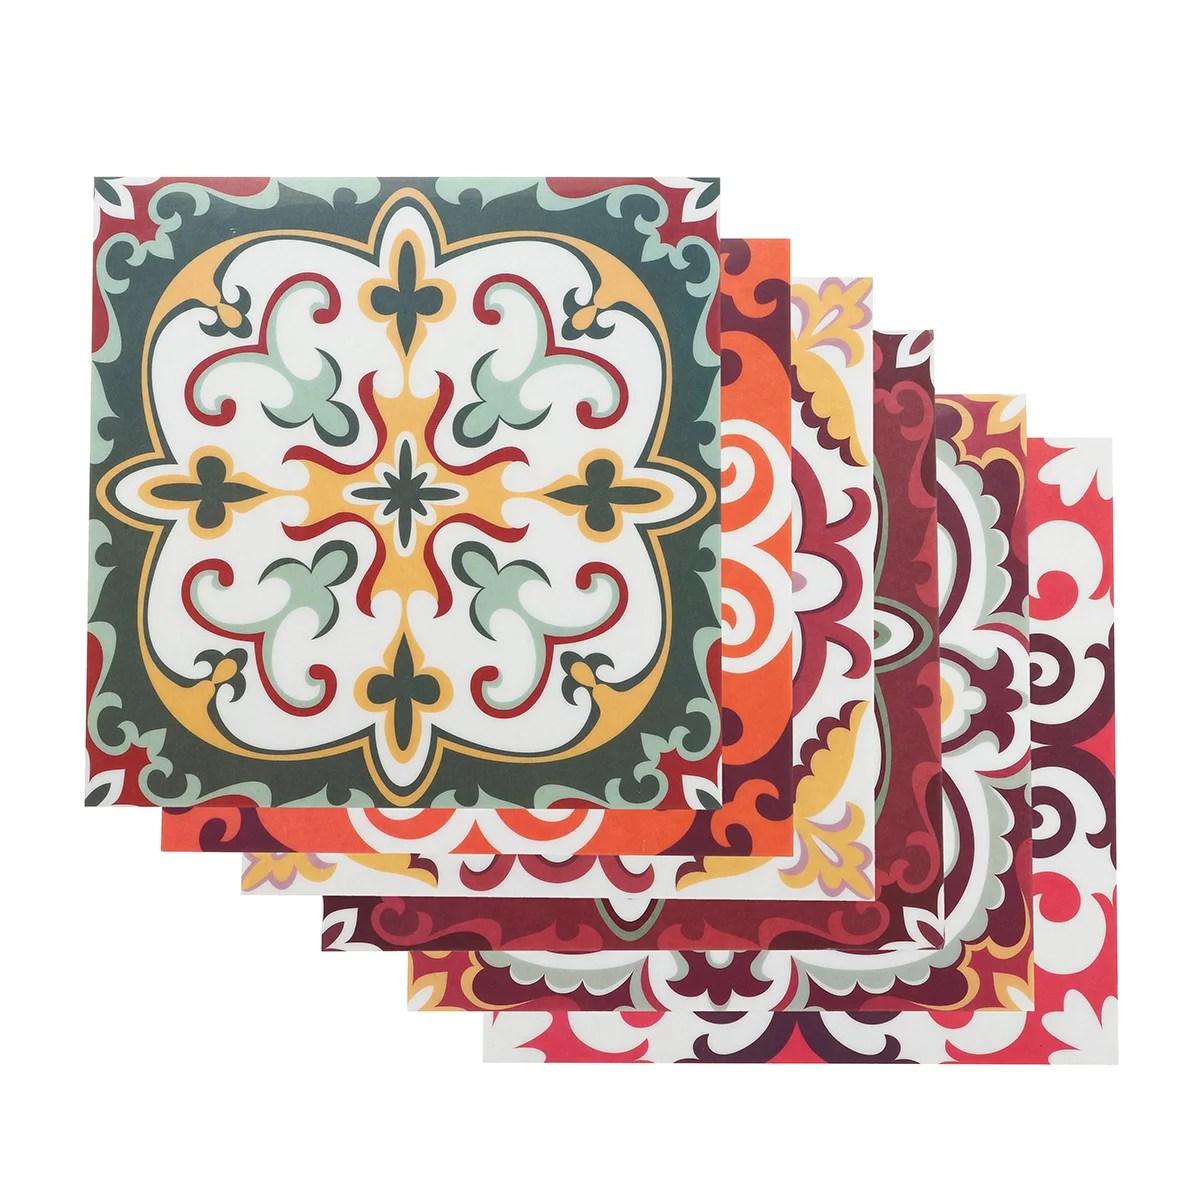 tile stickers kitchen backsplash bathroom vinyl waterproof peel and stick mexican talavera tile decal 6pcs 8 x 8 walmart com